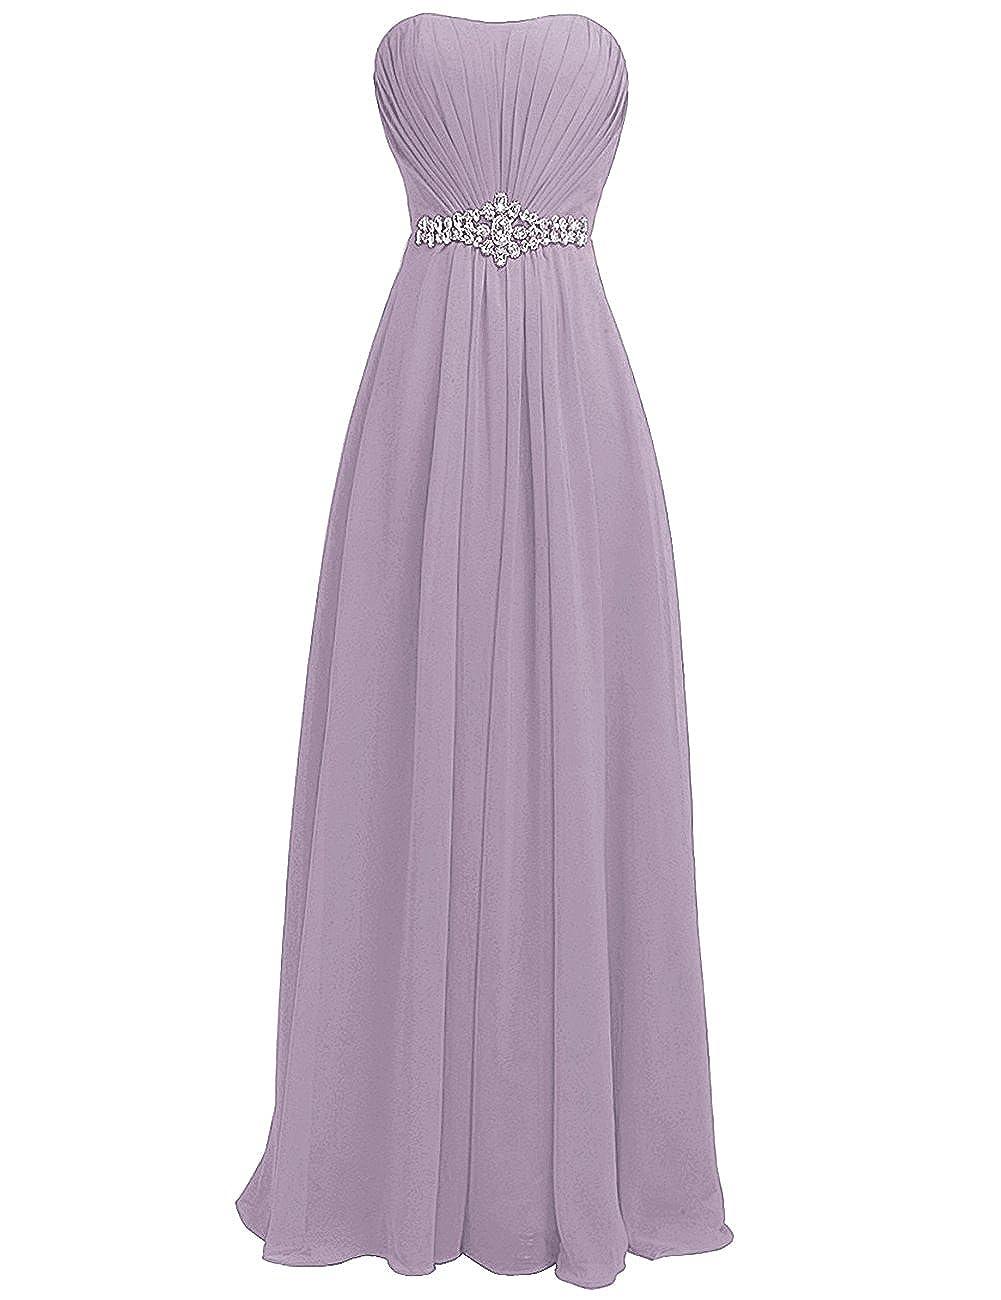 Light Purple H.S.D Women's Strapless Rhinestone Sash Long Bridesmaid Dress Evening Gown